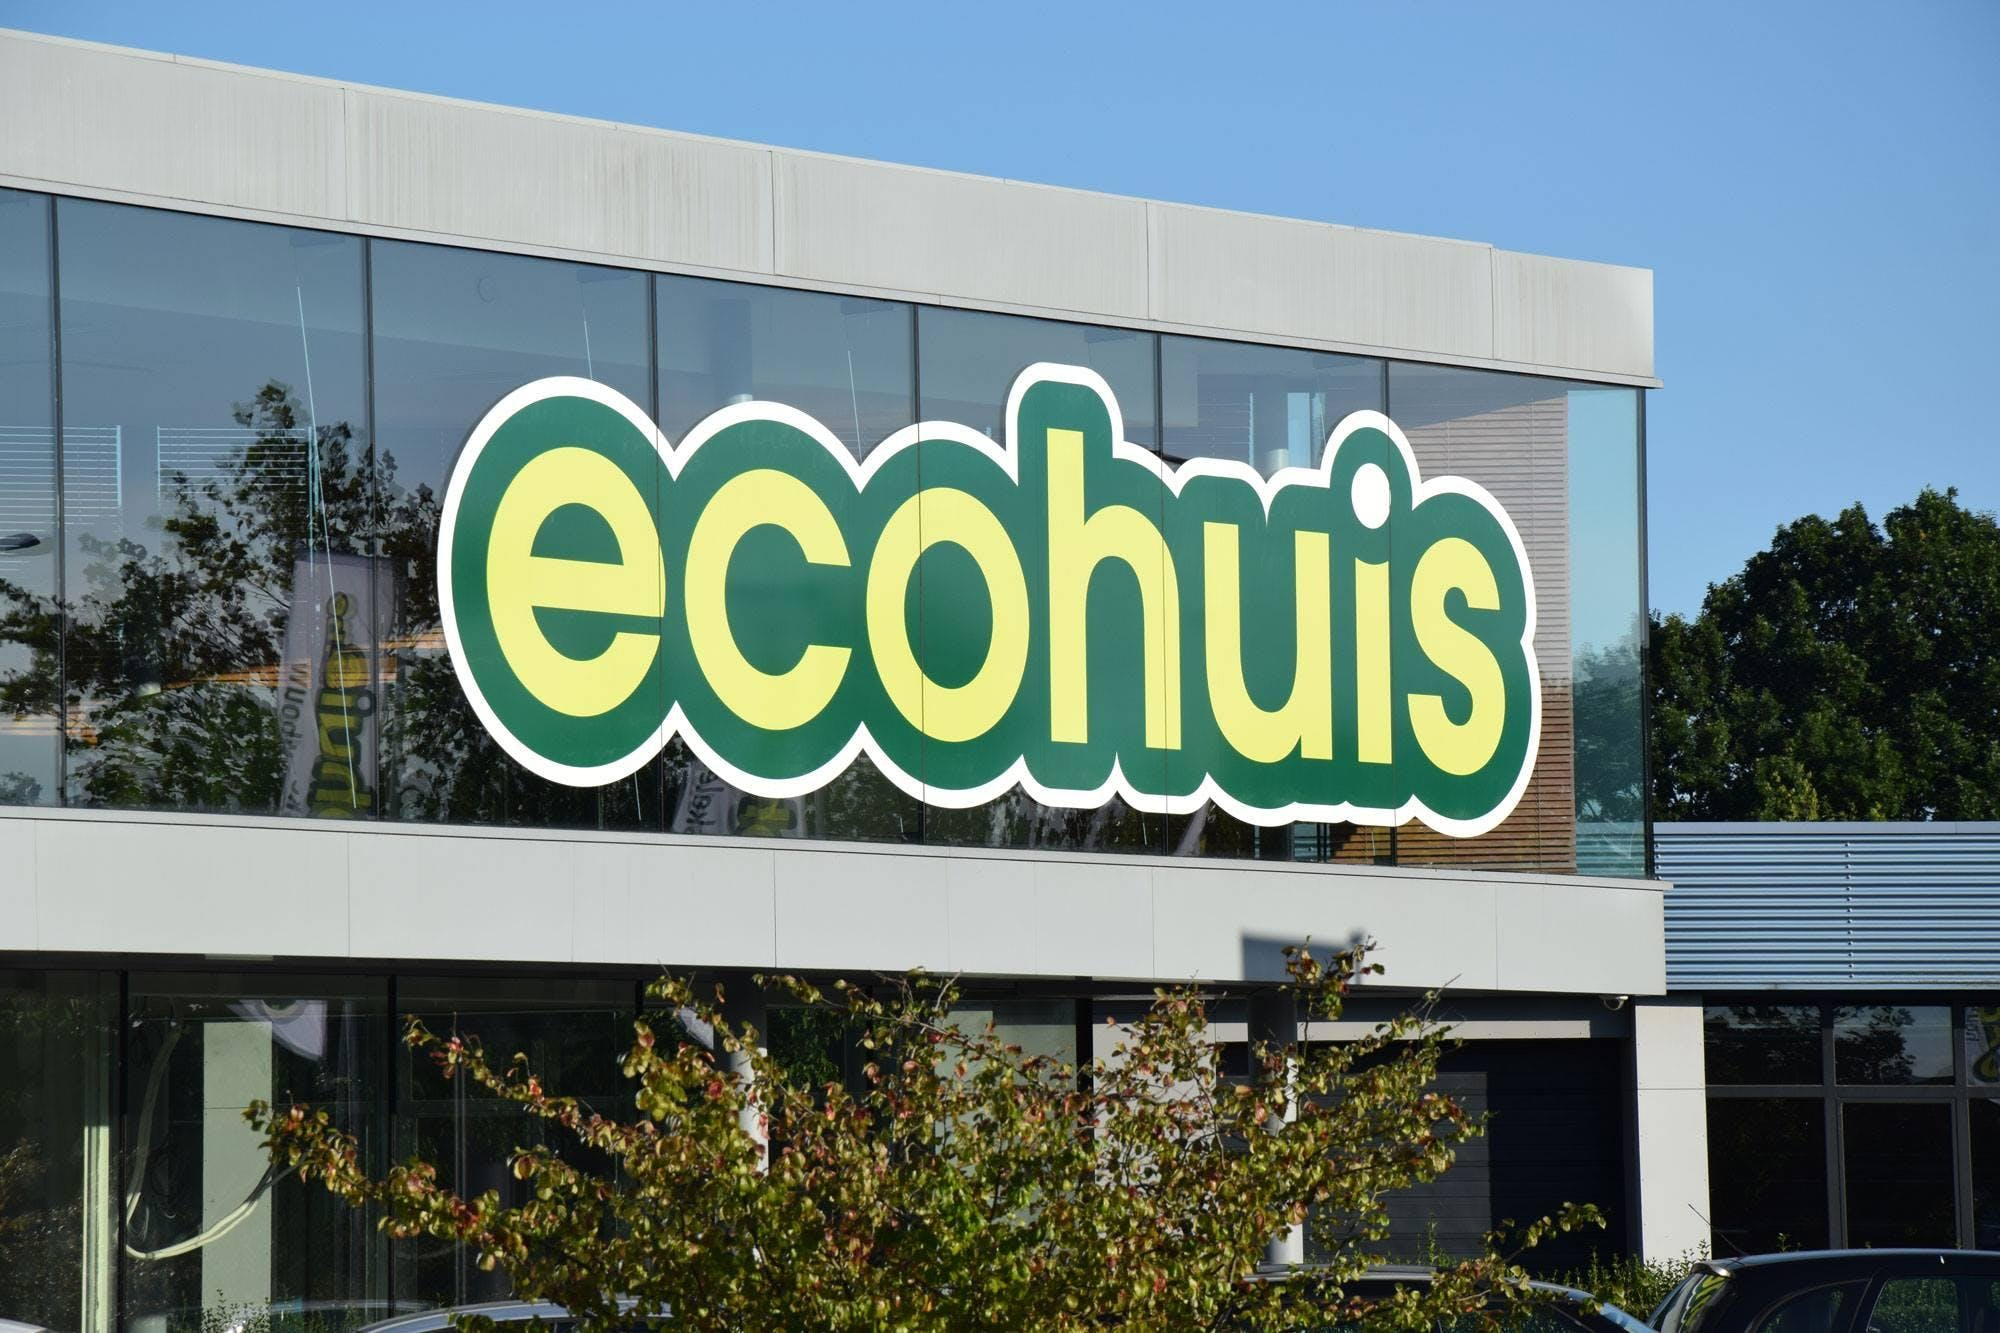 Ecohuis - INFOAVOND 6 SEPTEMBER 2018